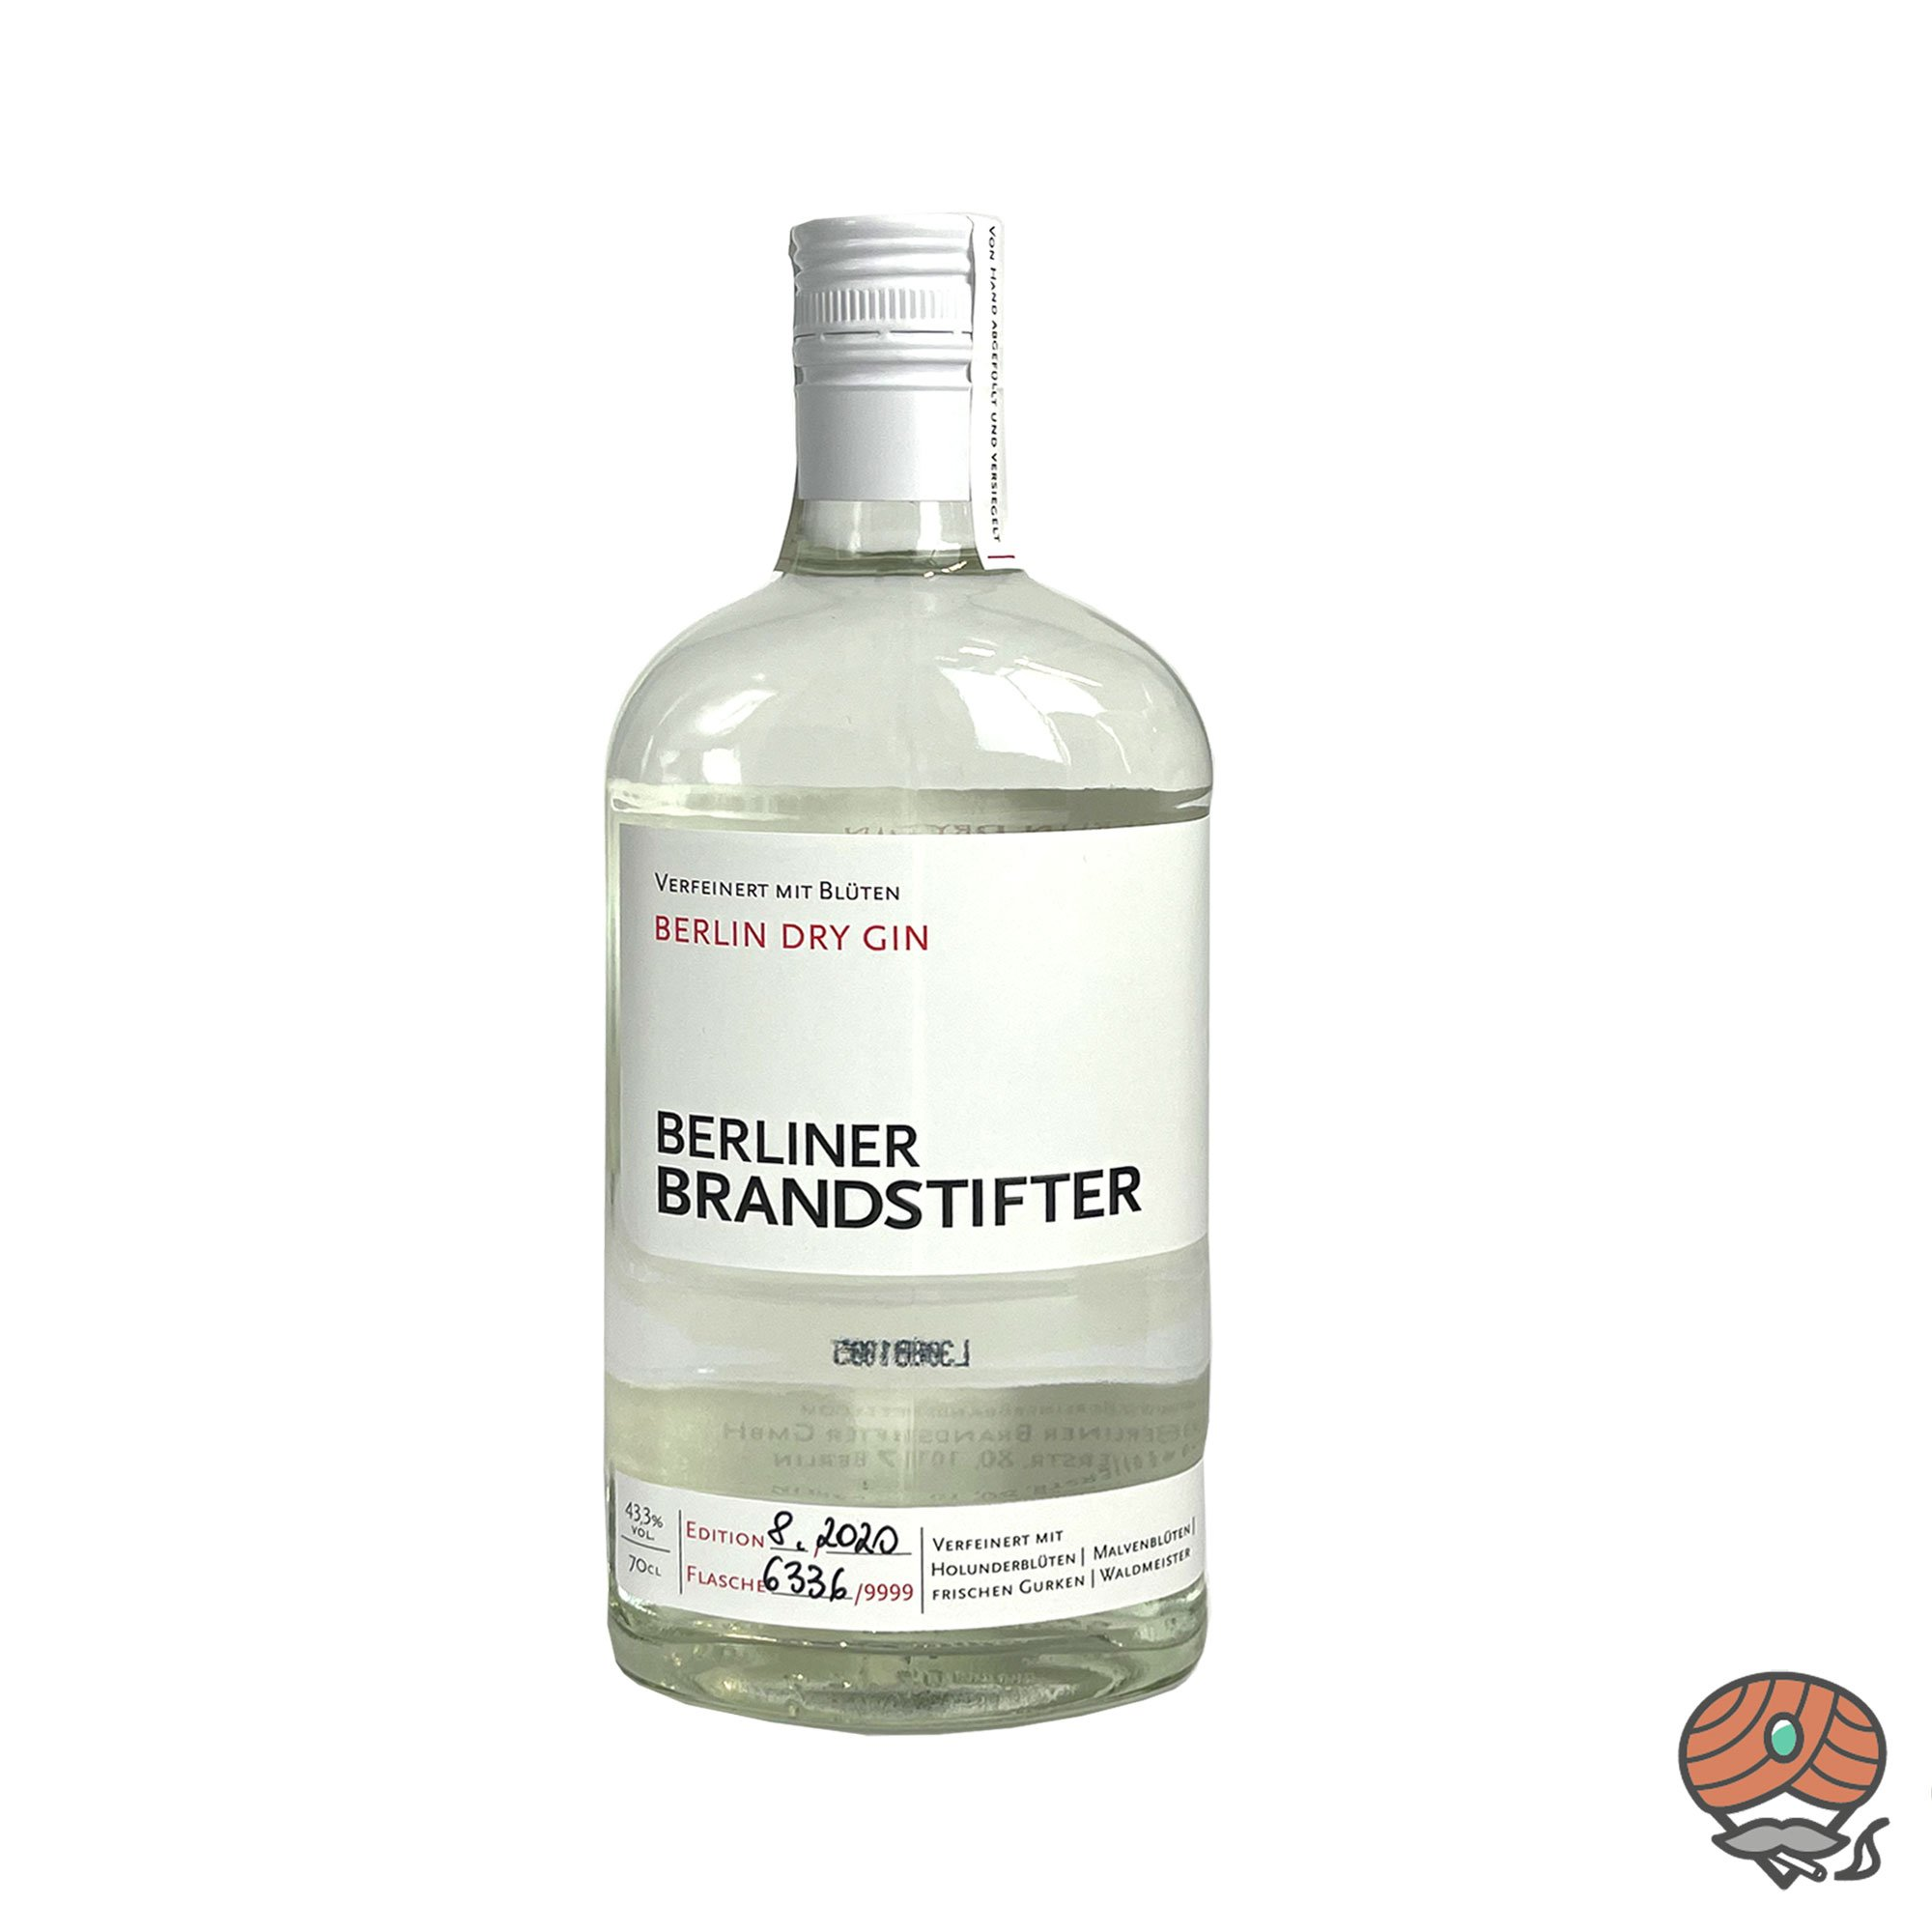 Beliner Brandstifter - Berlin Dry Gin 0,7l, alc. 43,3 Vol.-%